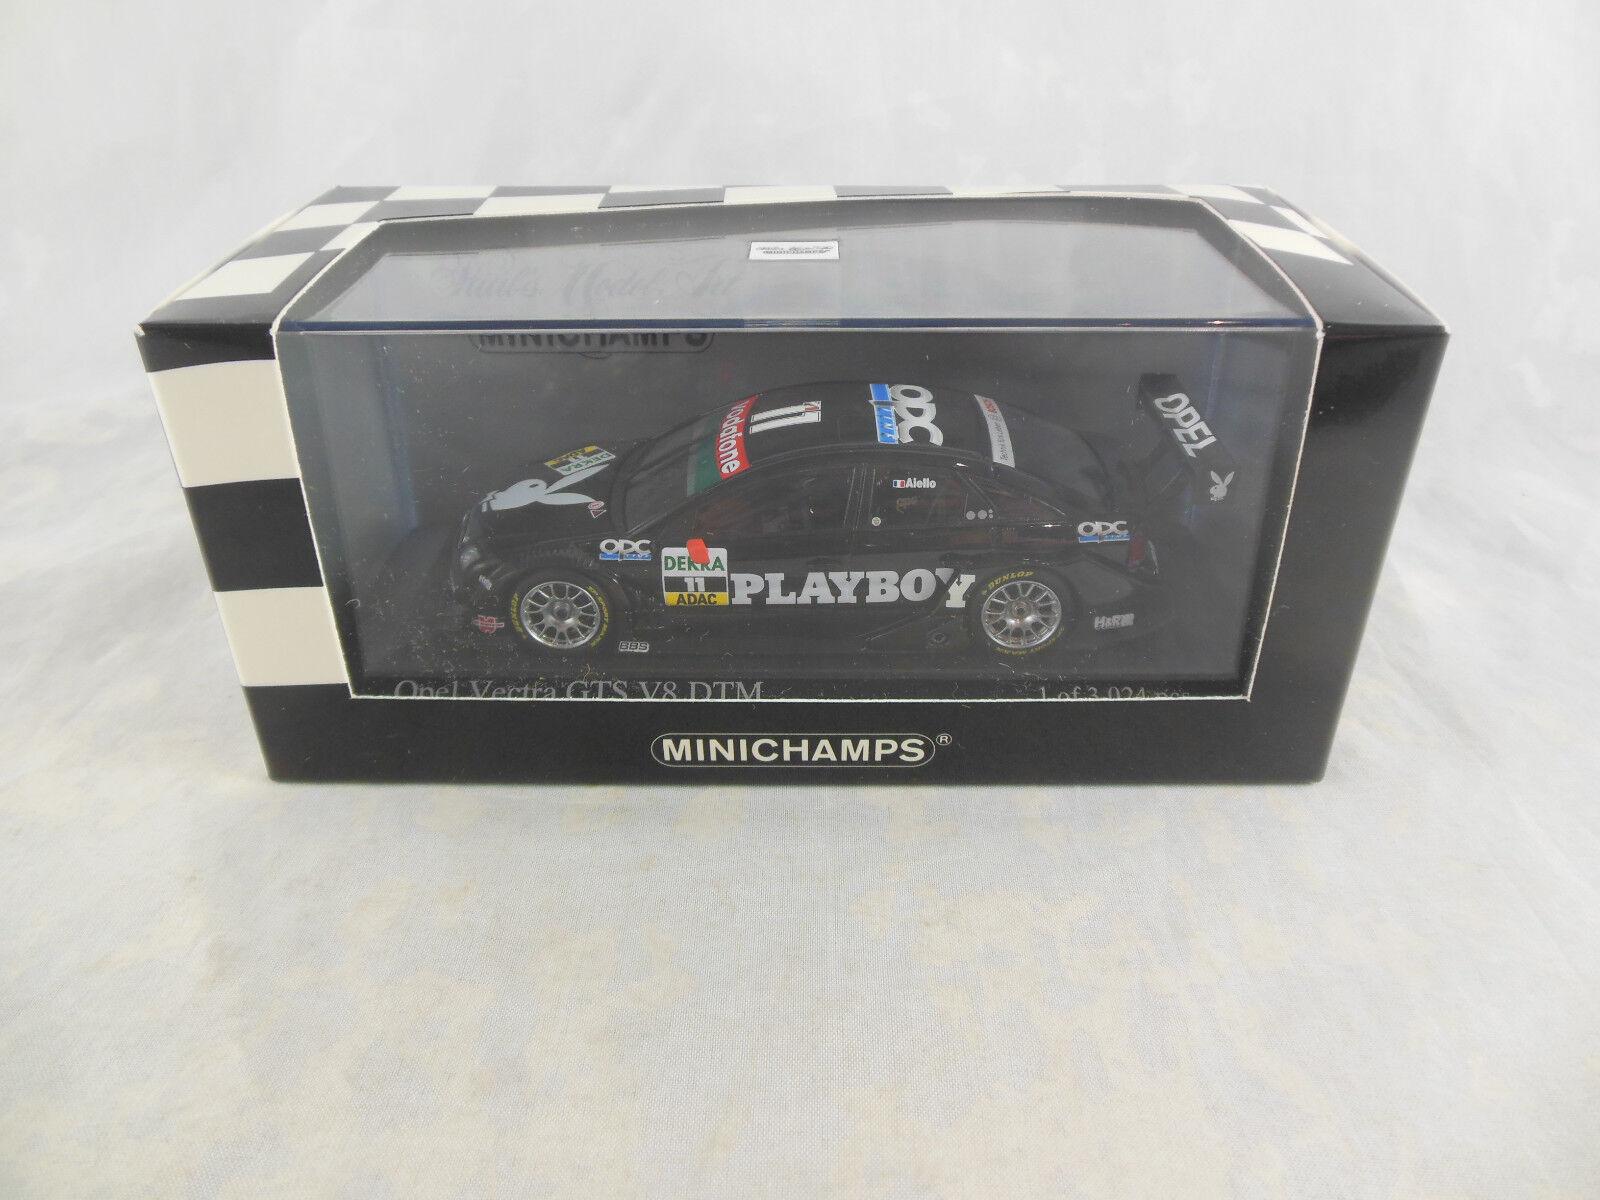 Scarce Minichamps 400 054611 Opel Vectra GTS V8 2005 DTM Team OPC Playboy Aiello